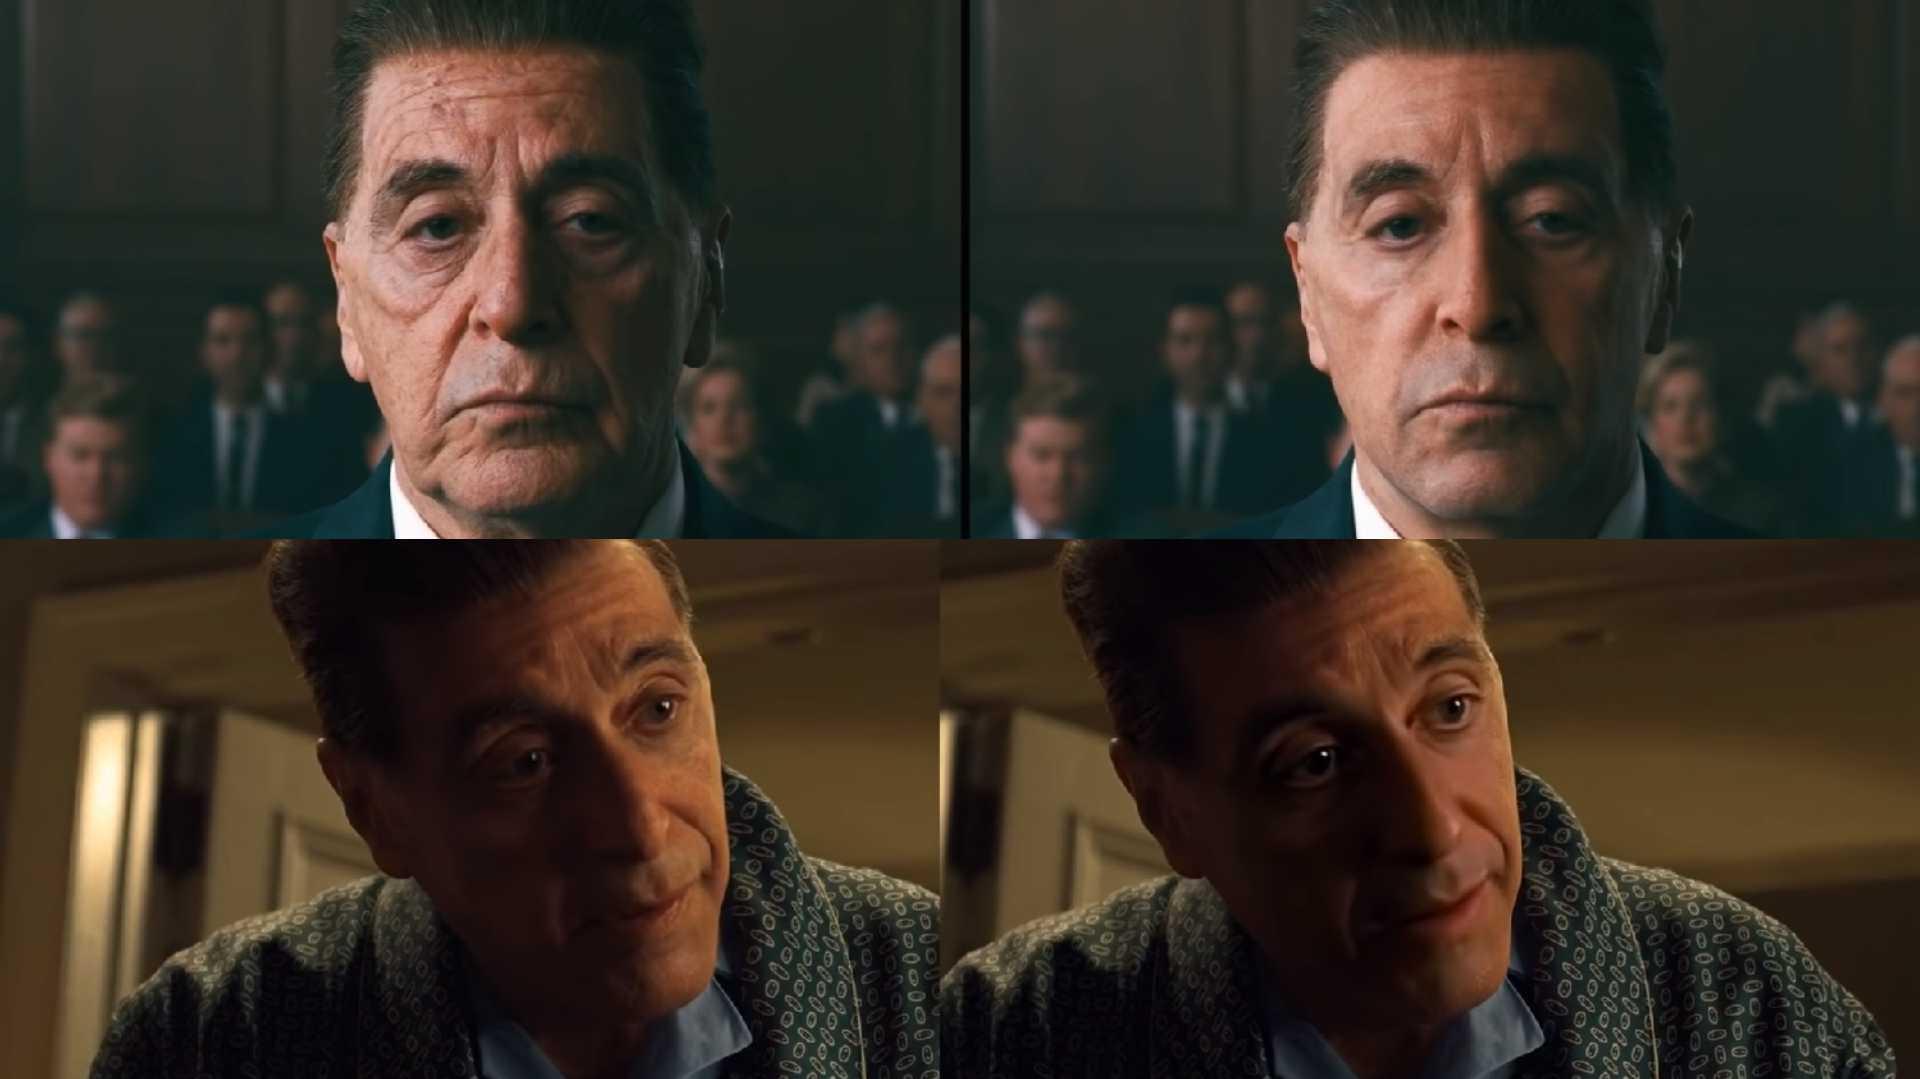 The Irishman Netflix vs. Deepfake Vergleich Al Pacino